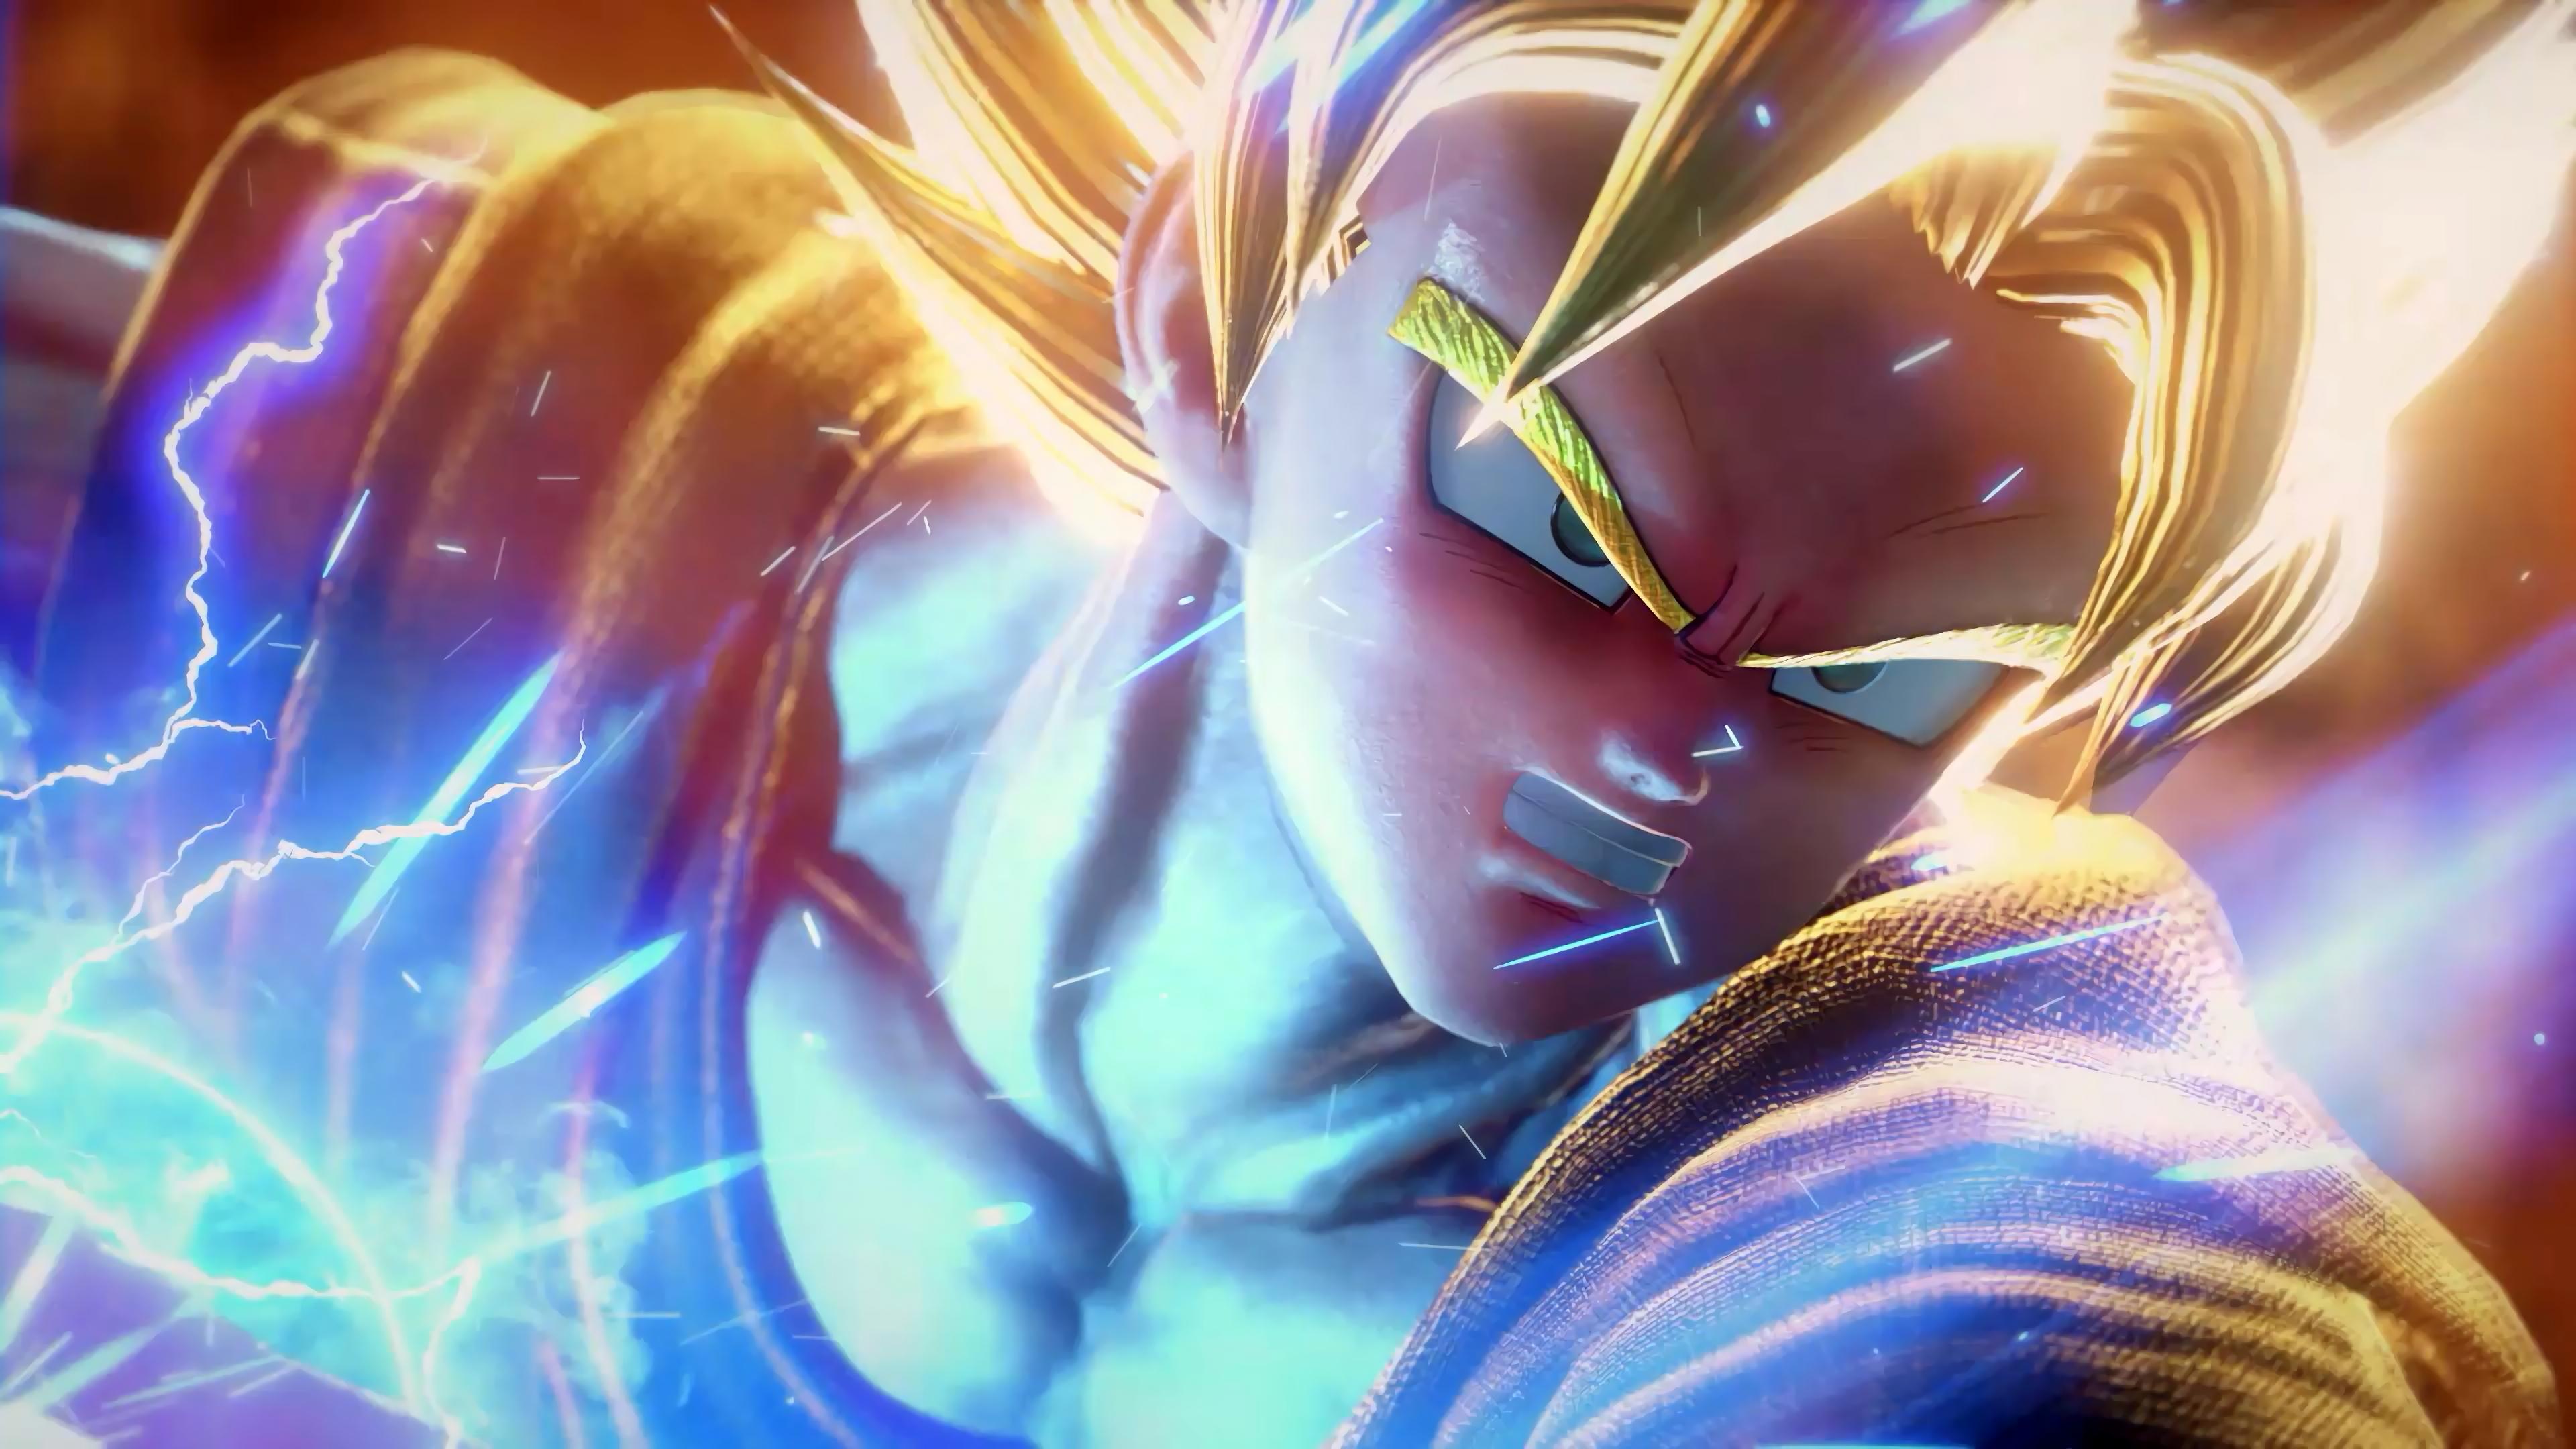 Goku Jump Force 4k, HD Games, 4k Wallpapers, Images ...